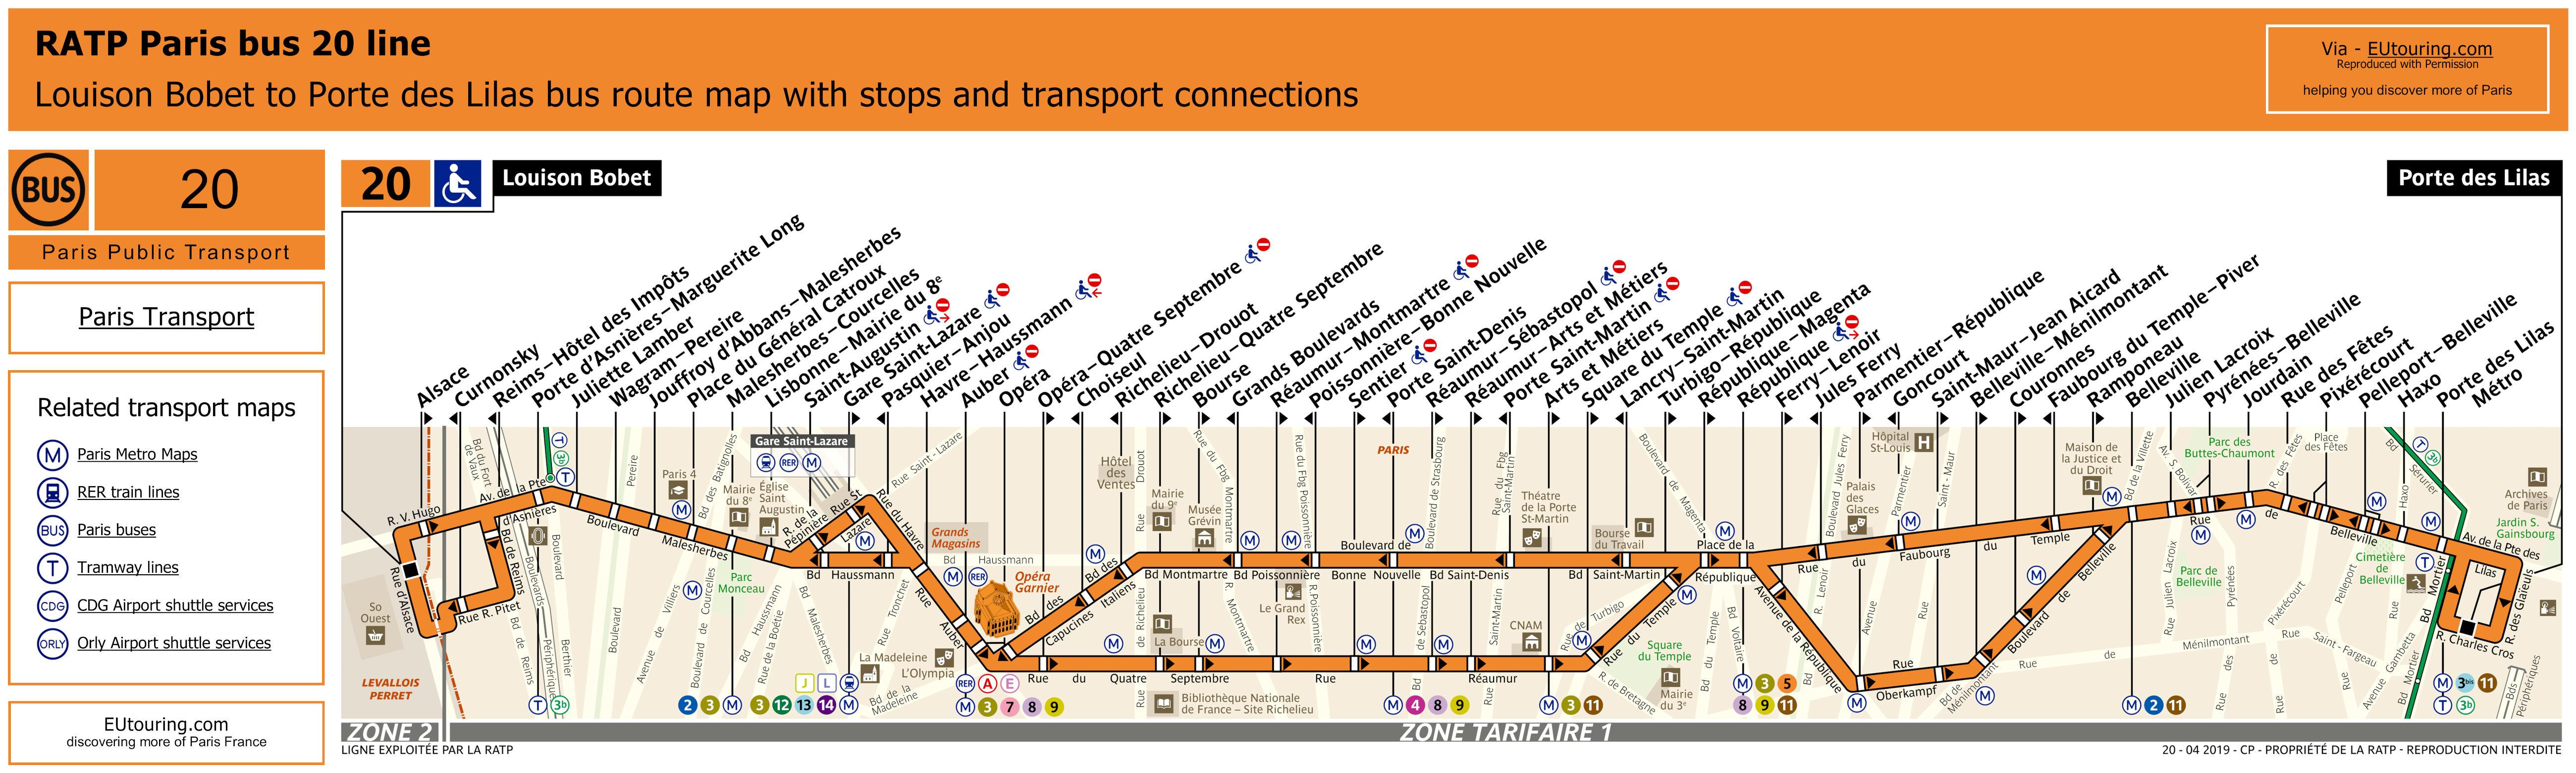 ratp route maps for paris bus lines 20 through to 29